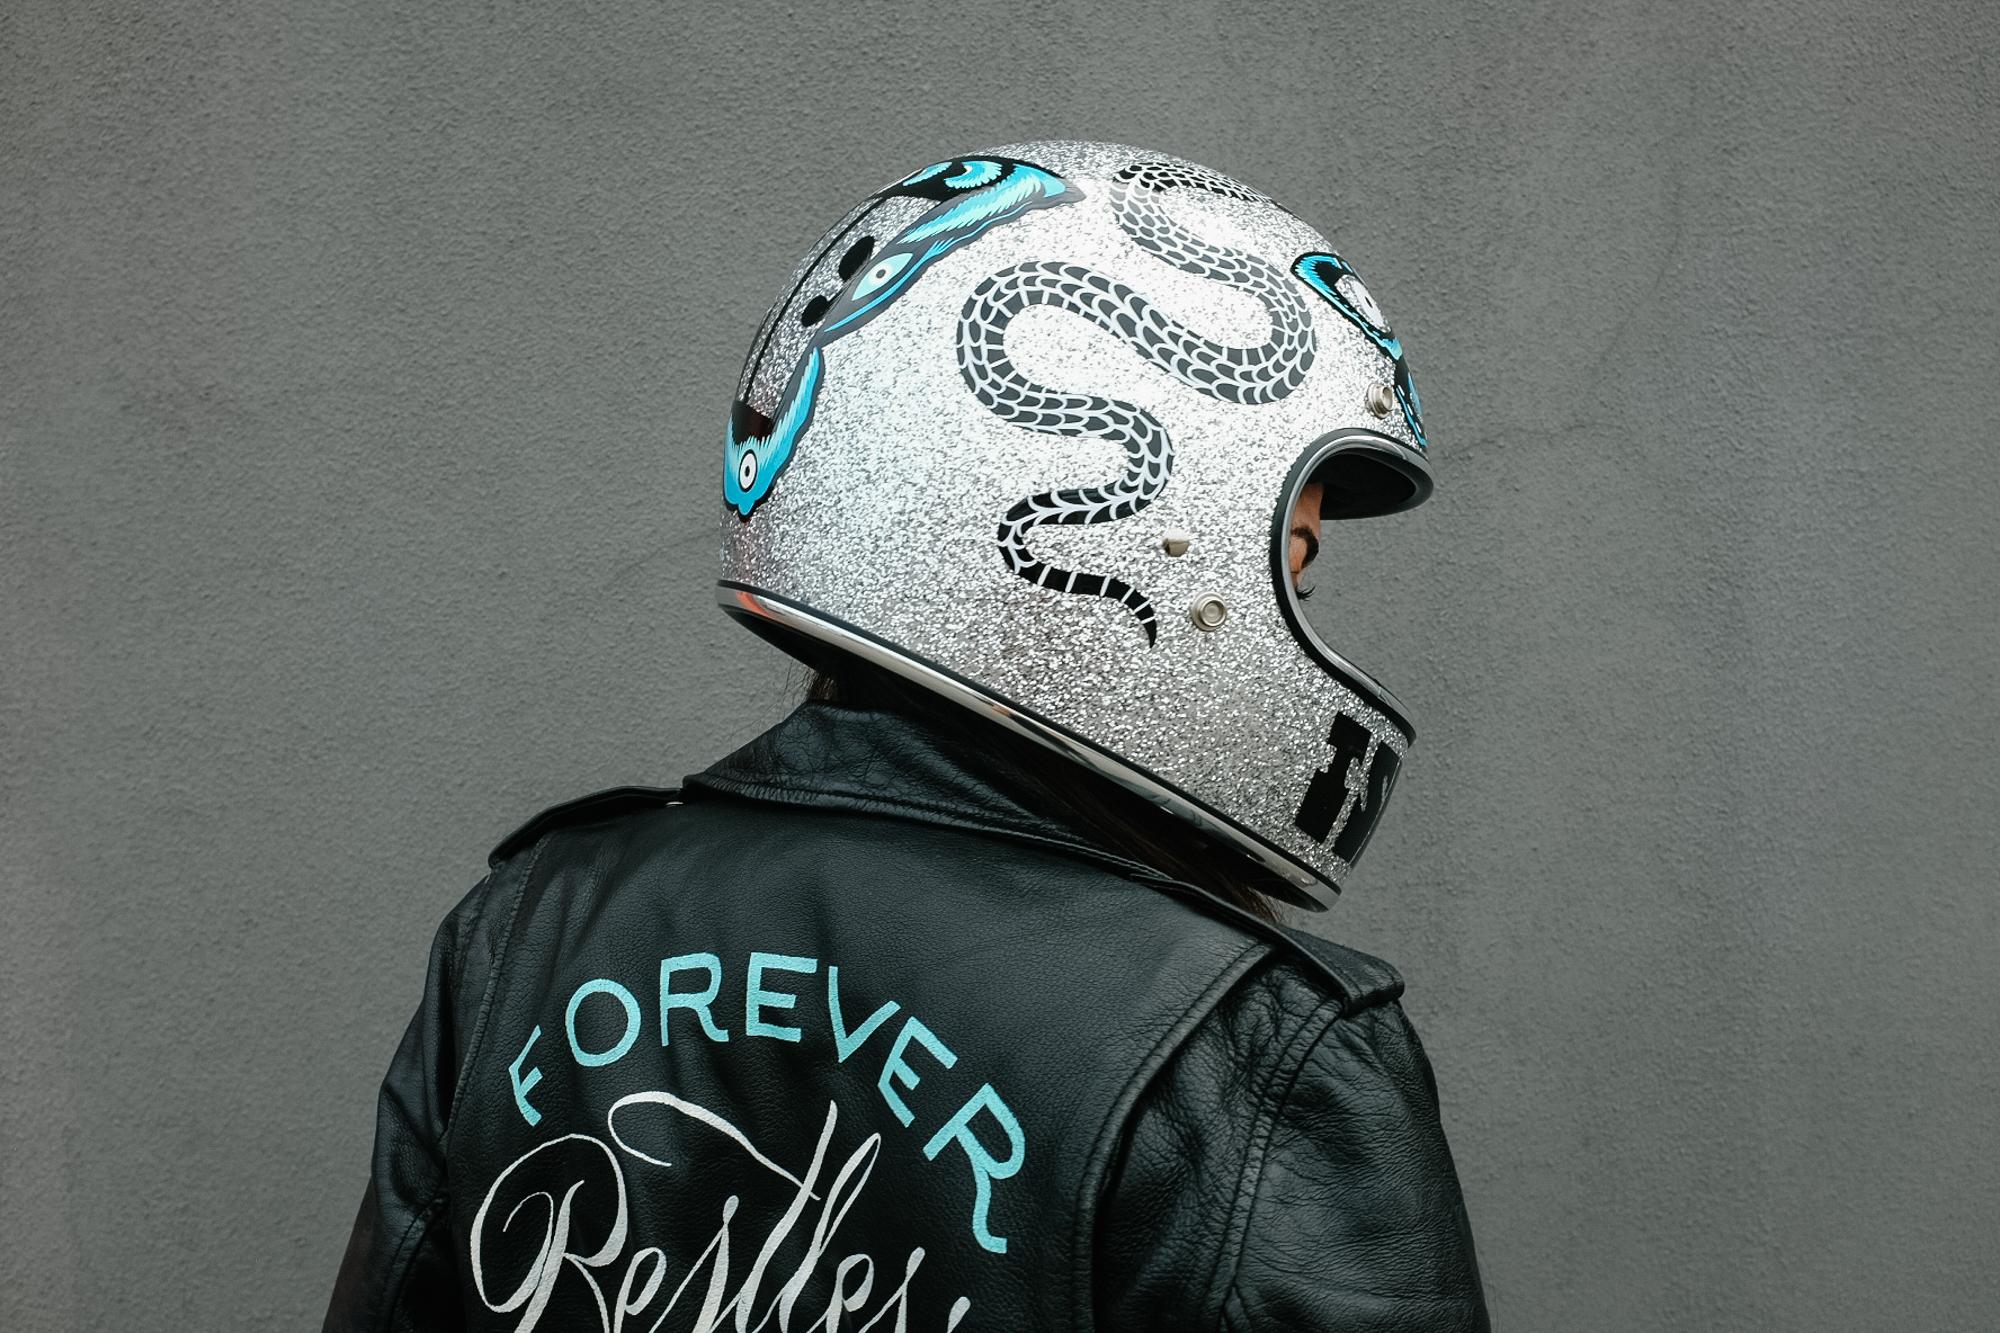 BRO-Mussari-Helmet-22.jpg